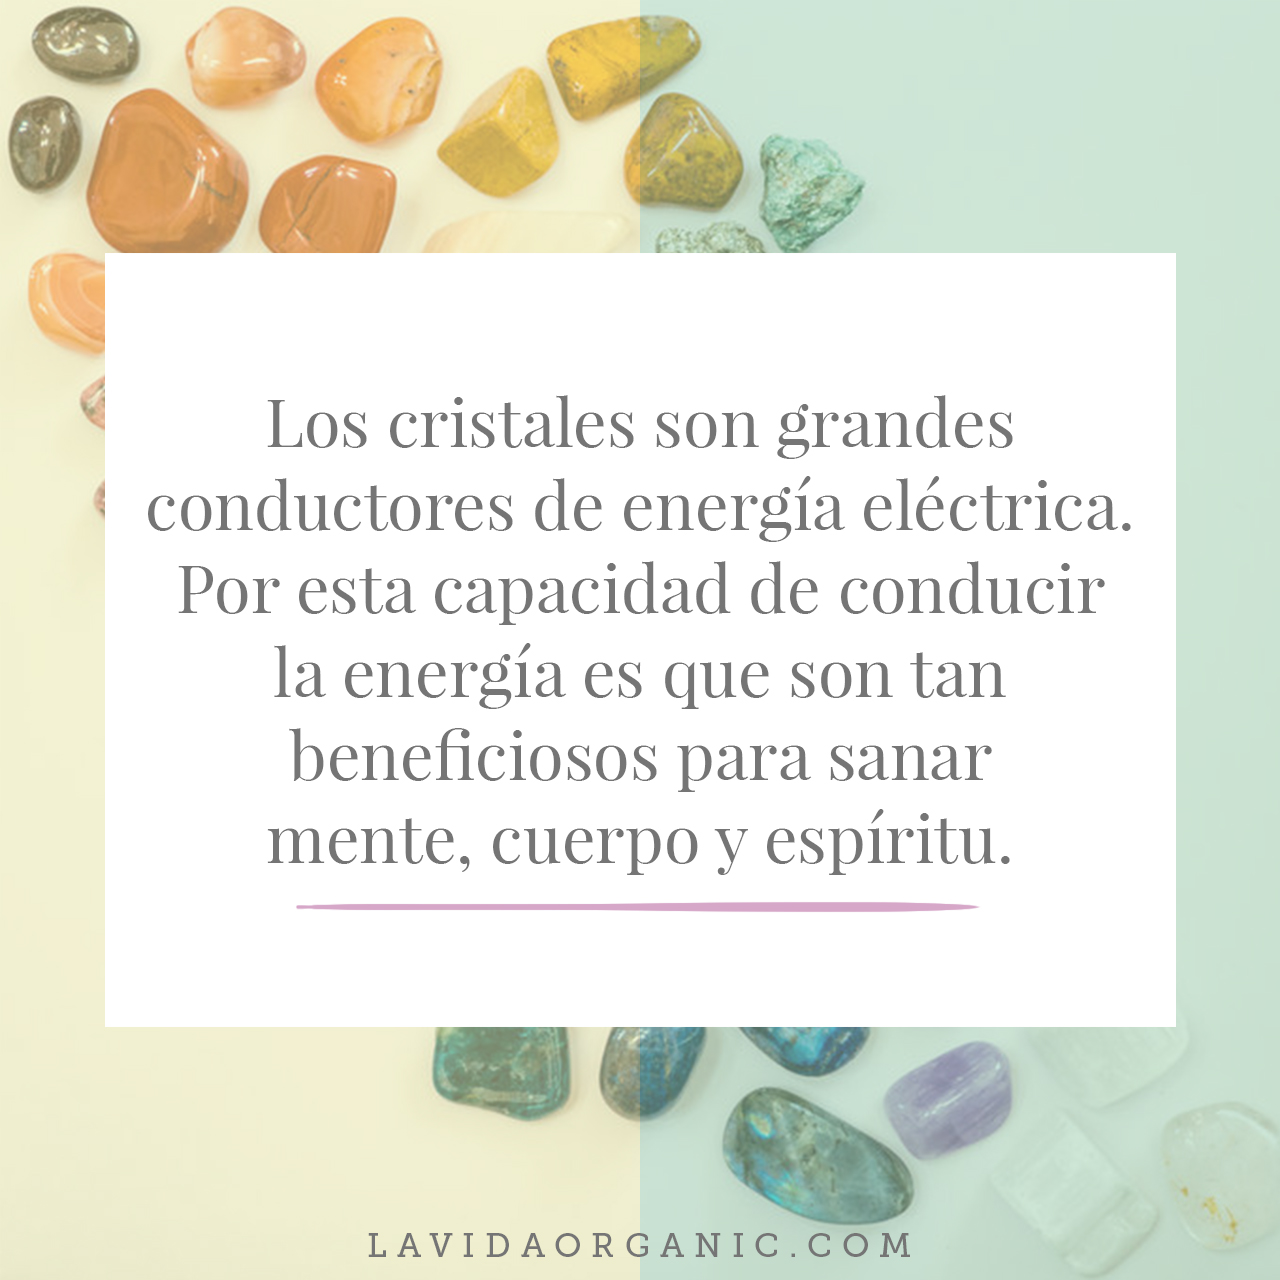 cristales4 (1).jpg